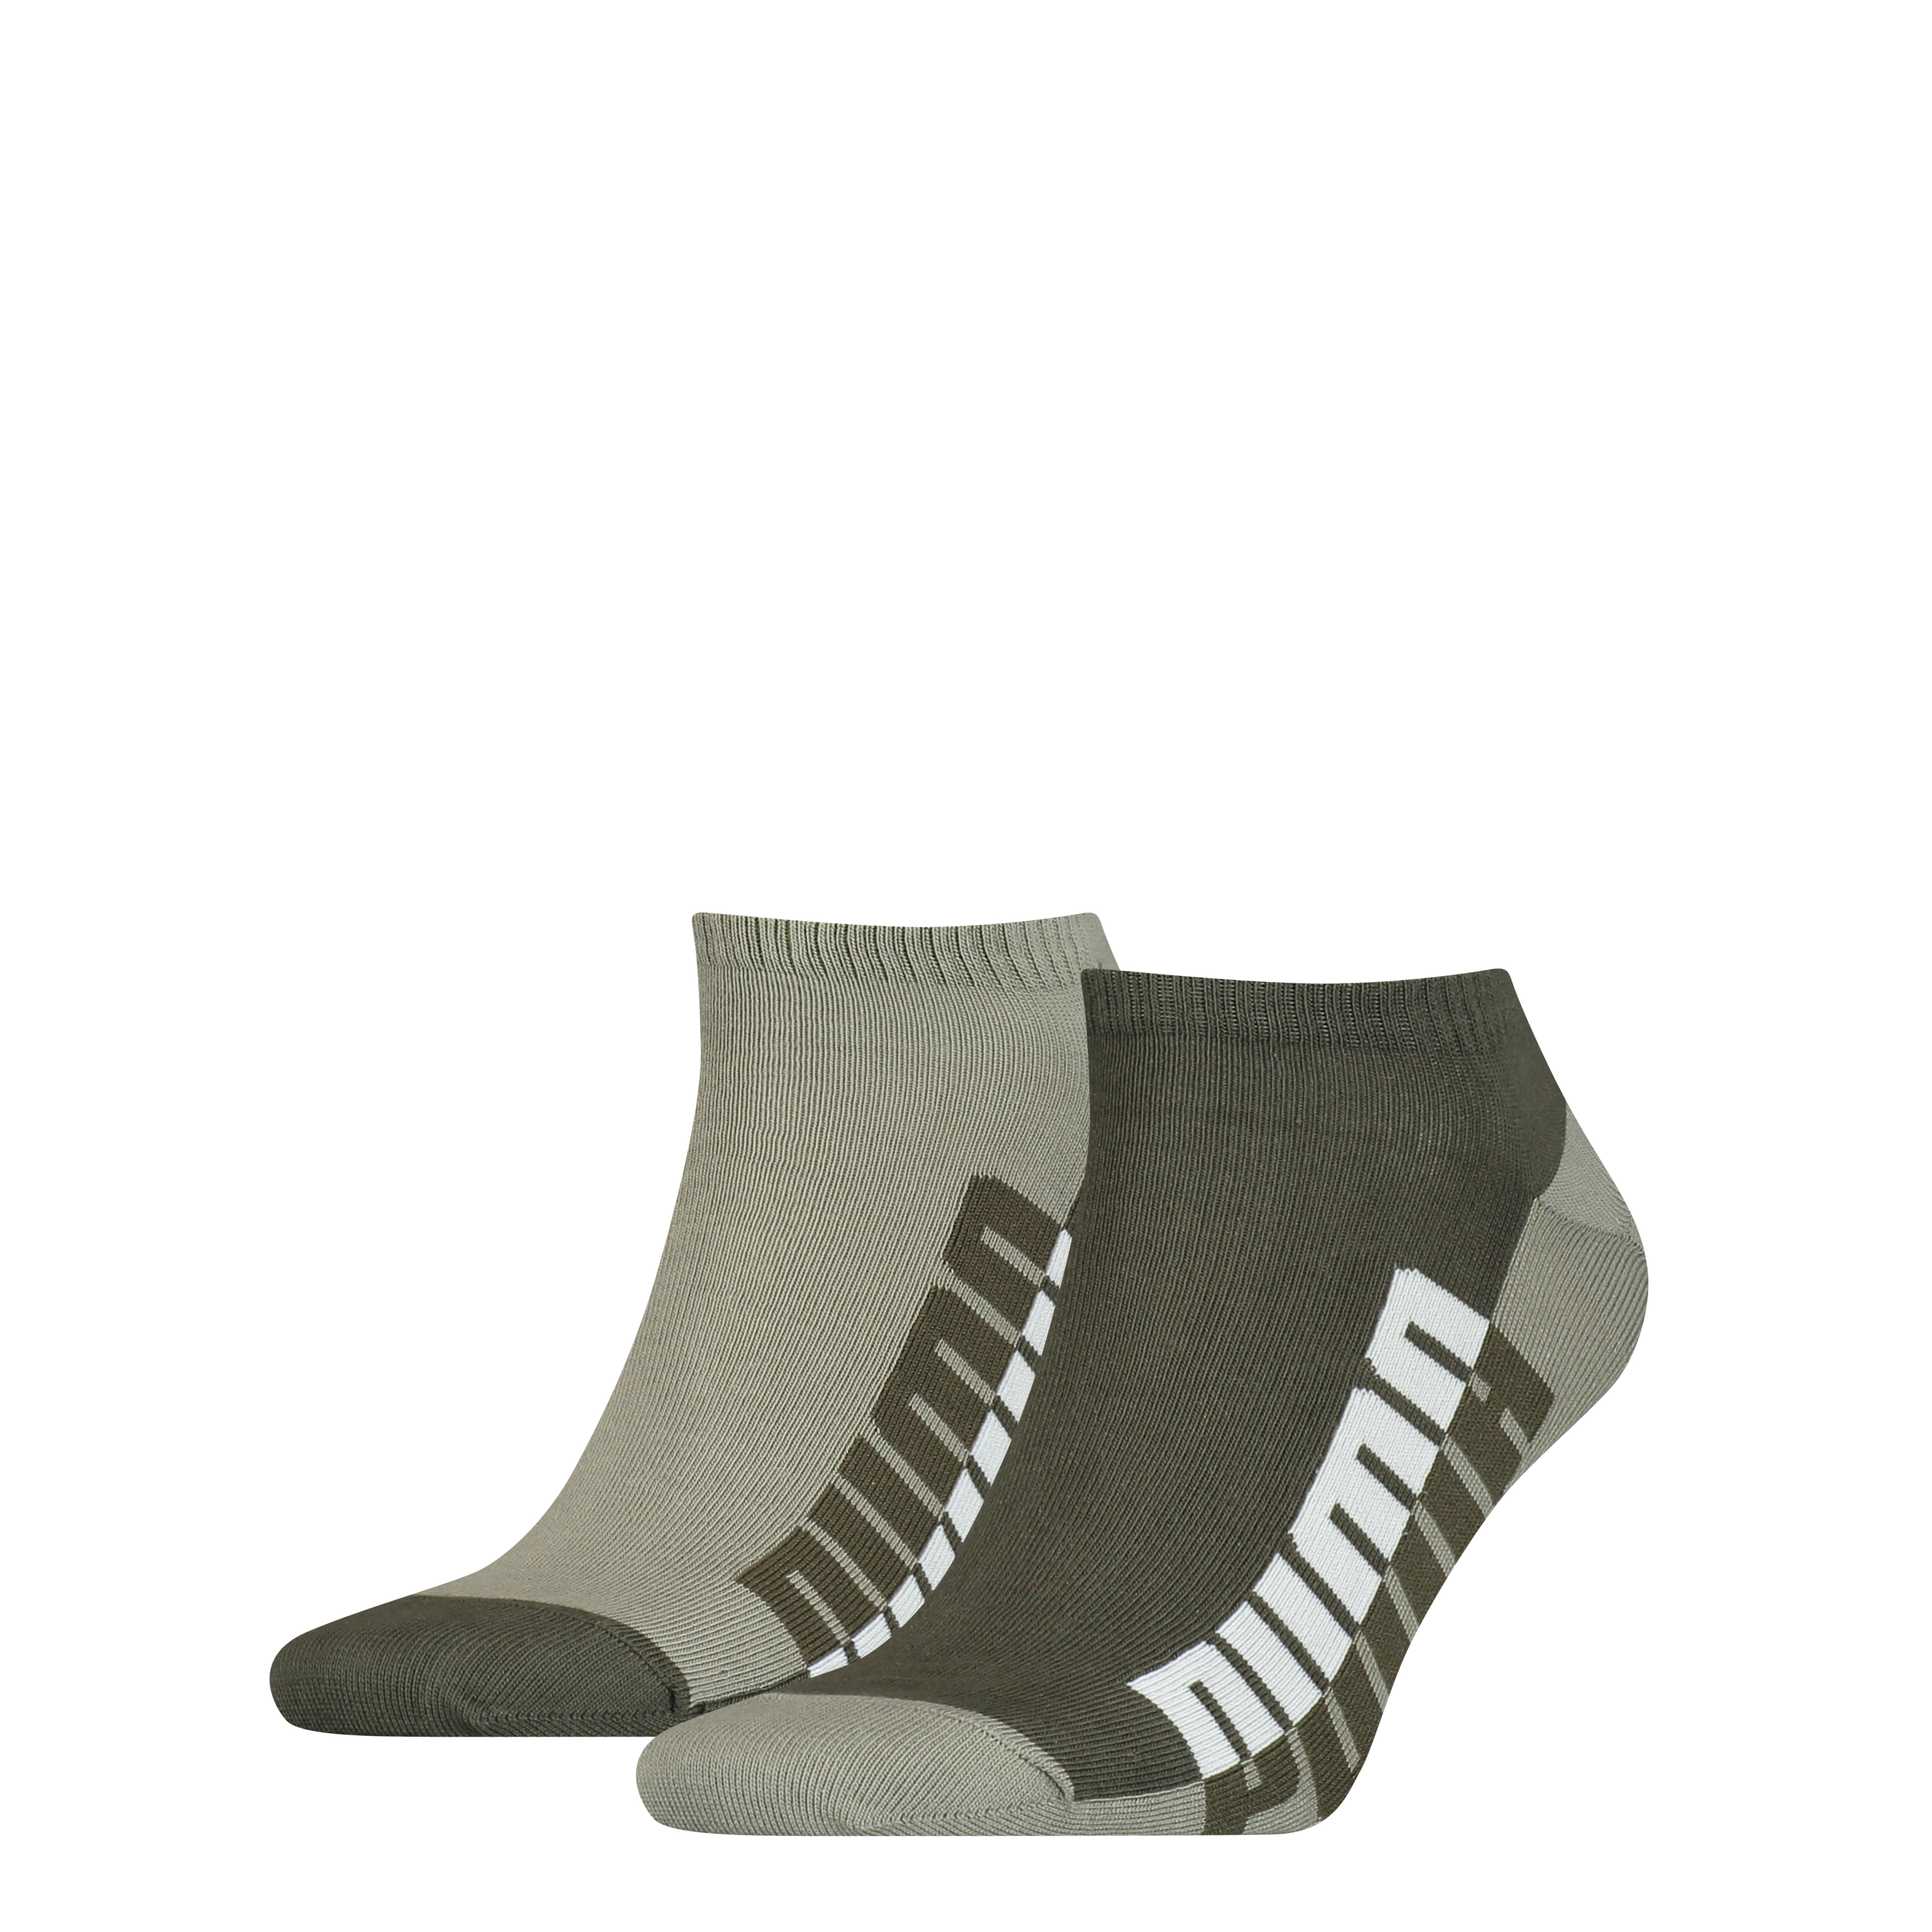 Puma Sneaker Sokken Heren 2-pack Green-39/42